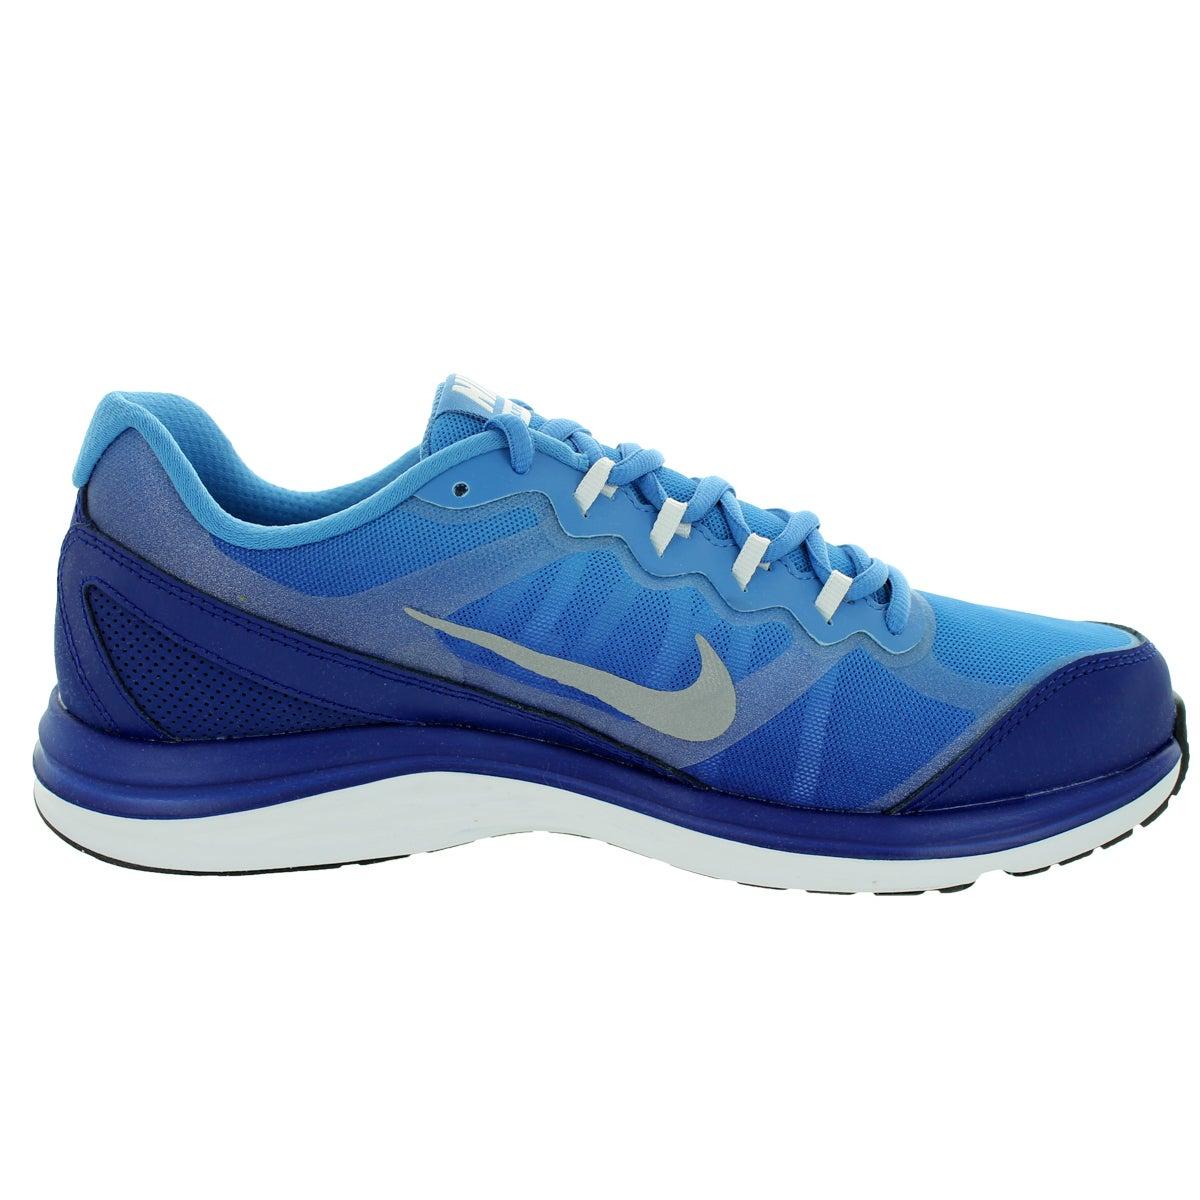 f0dbd12f65b3be Shop Nike Men s Dual Fusion Run 3 Premium Royal Blue Rflct Slvr Hrzn Ml Running  Shoe - Free Shipping Today - Overstock.com - 12328697